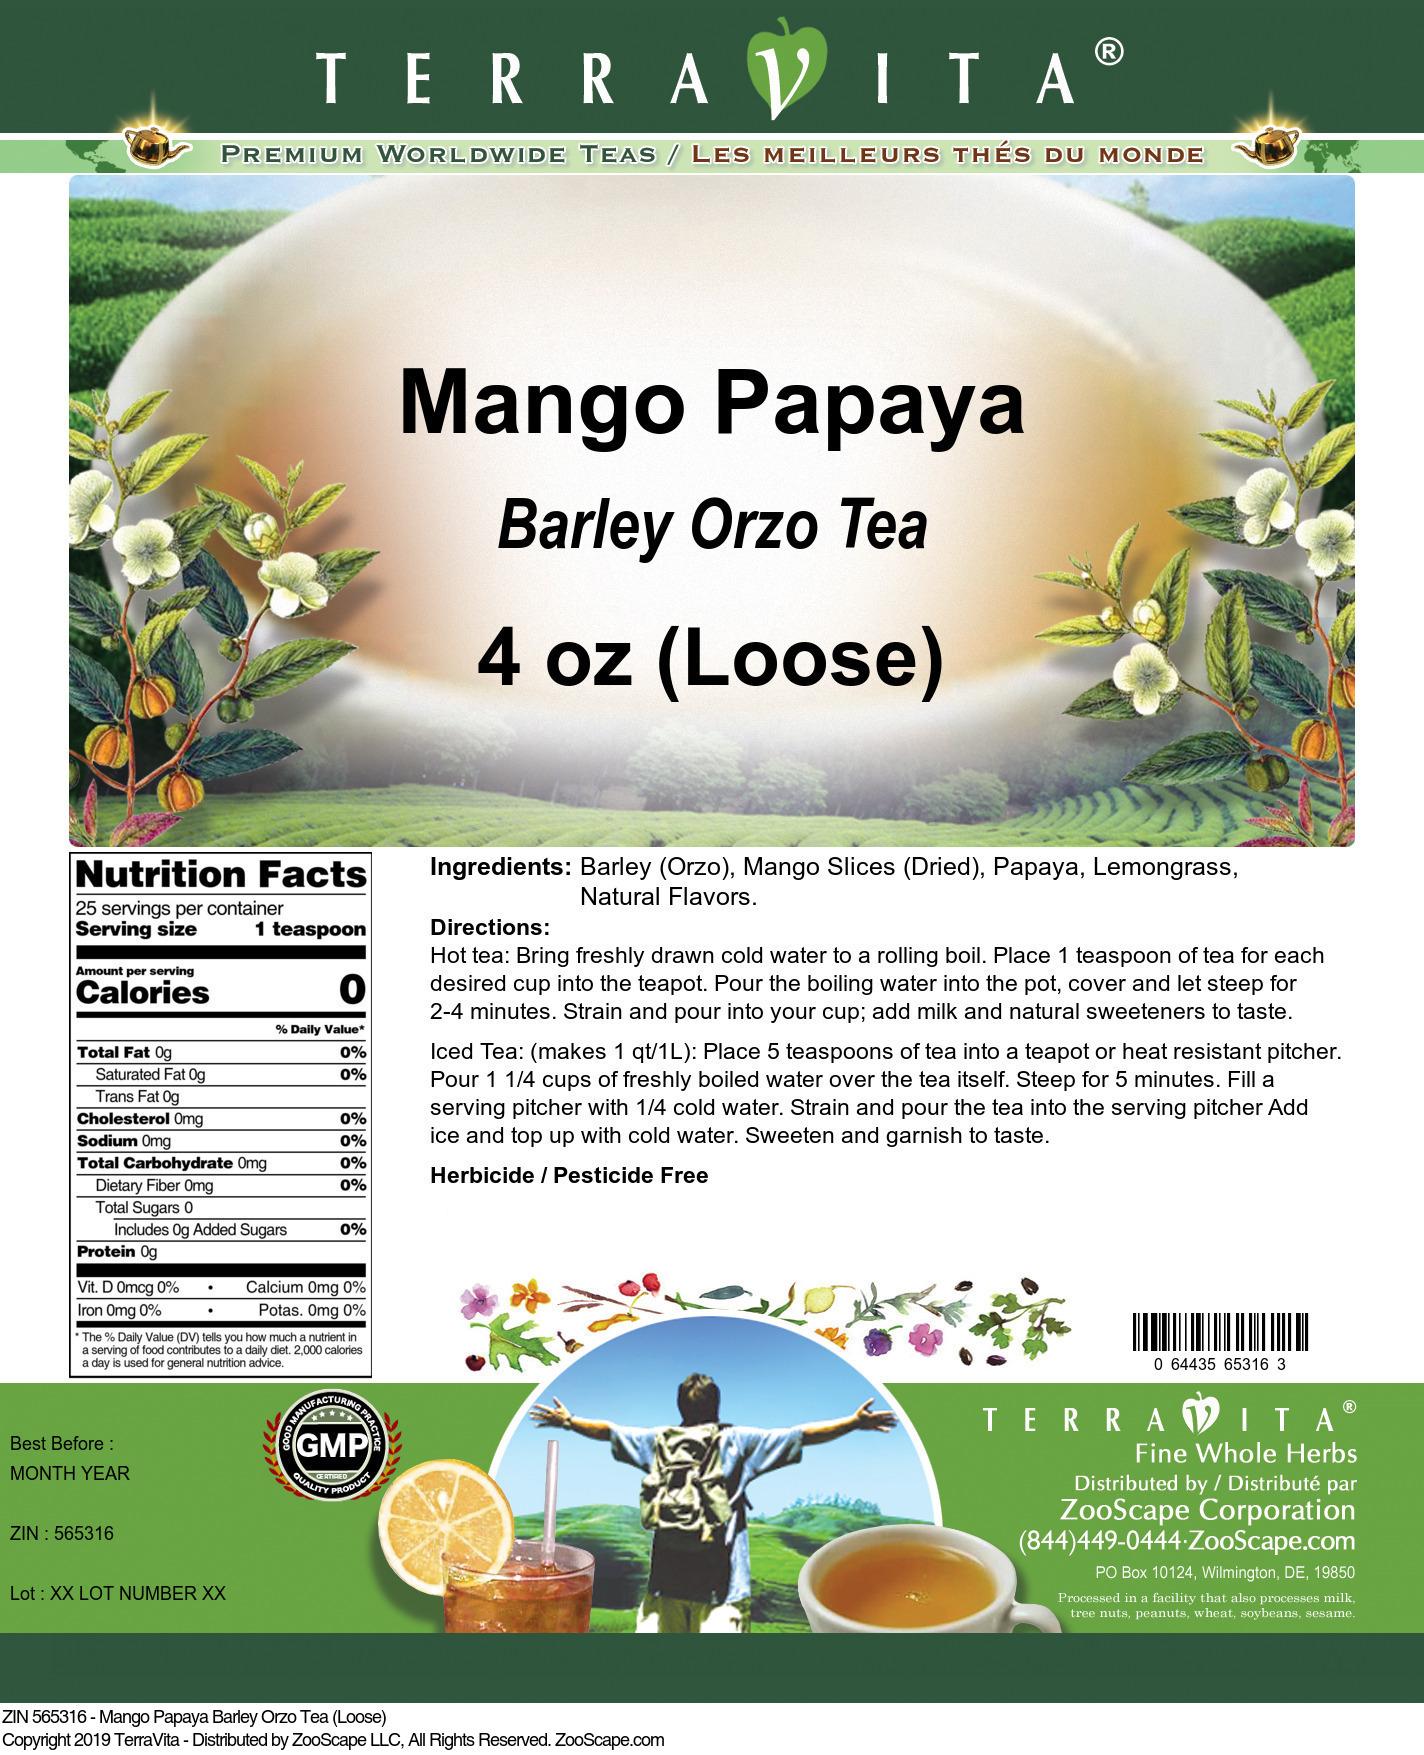 Mango Papaya Barley Orzo Tea (Loose)